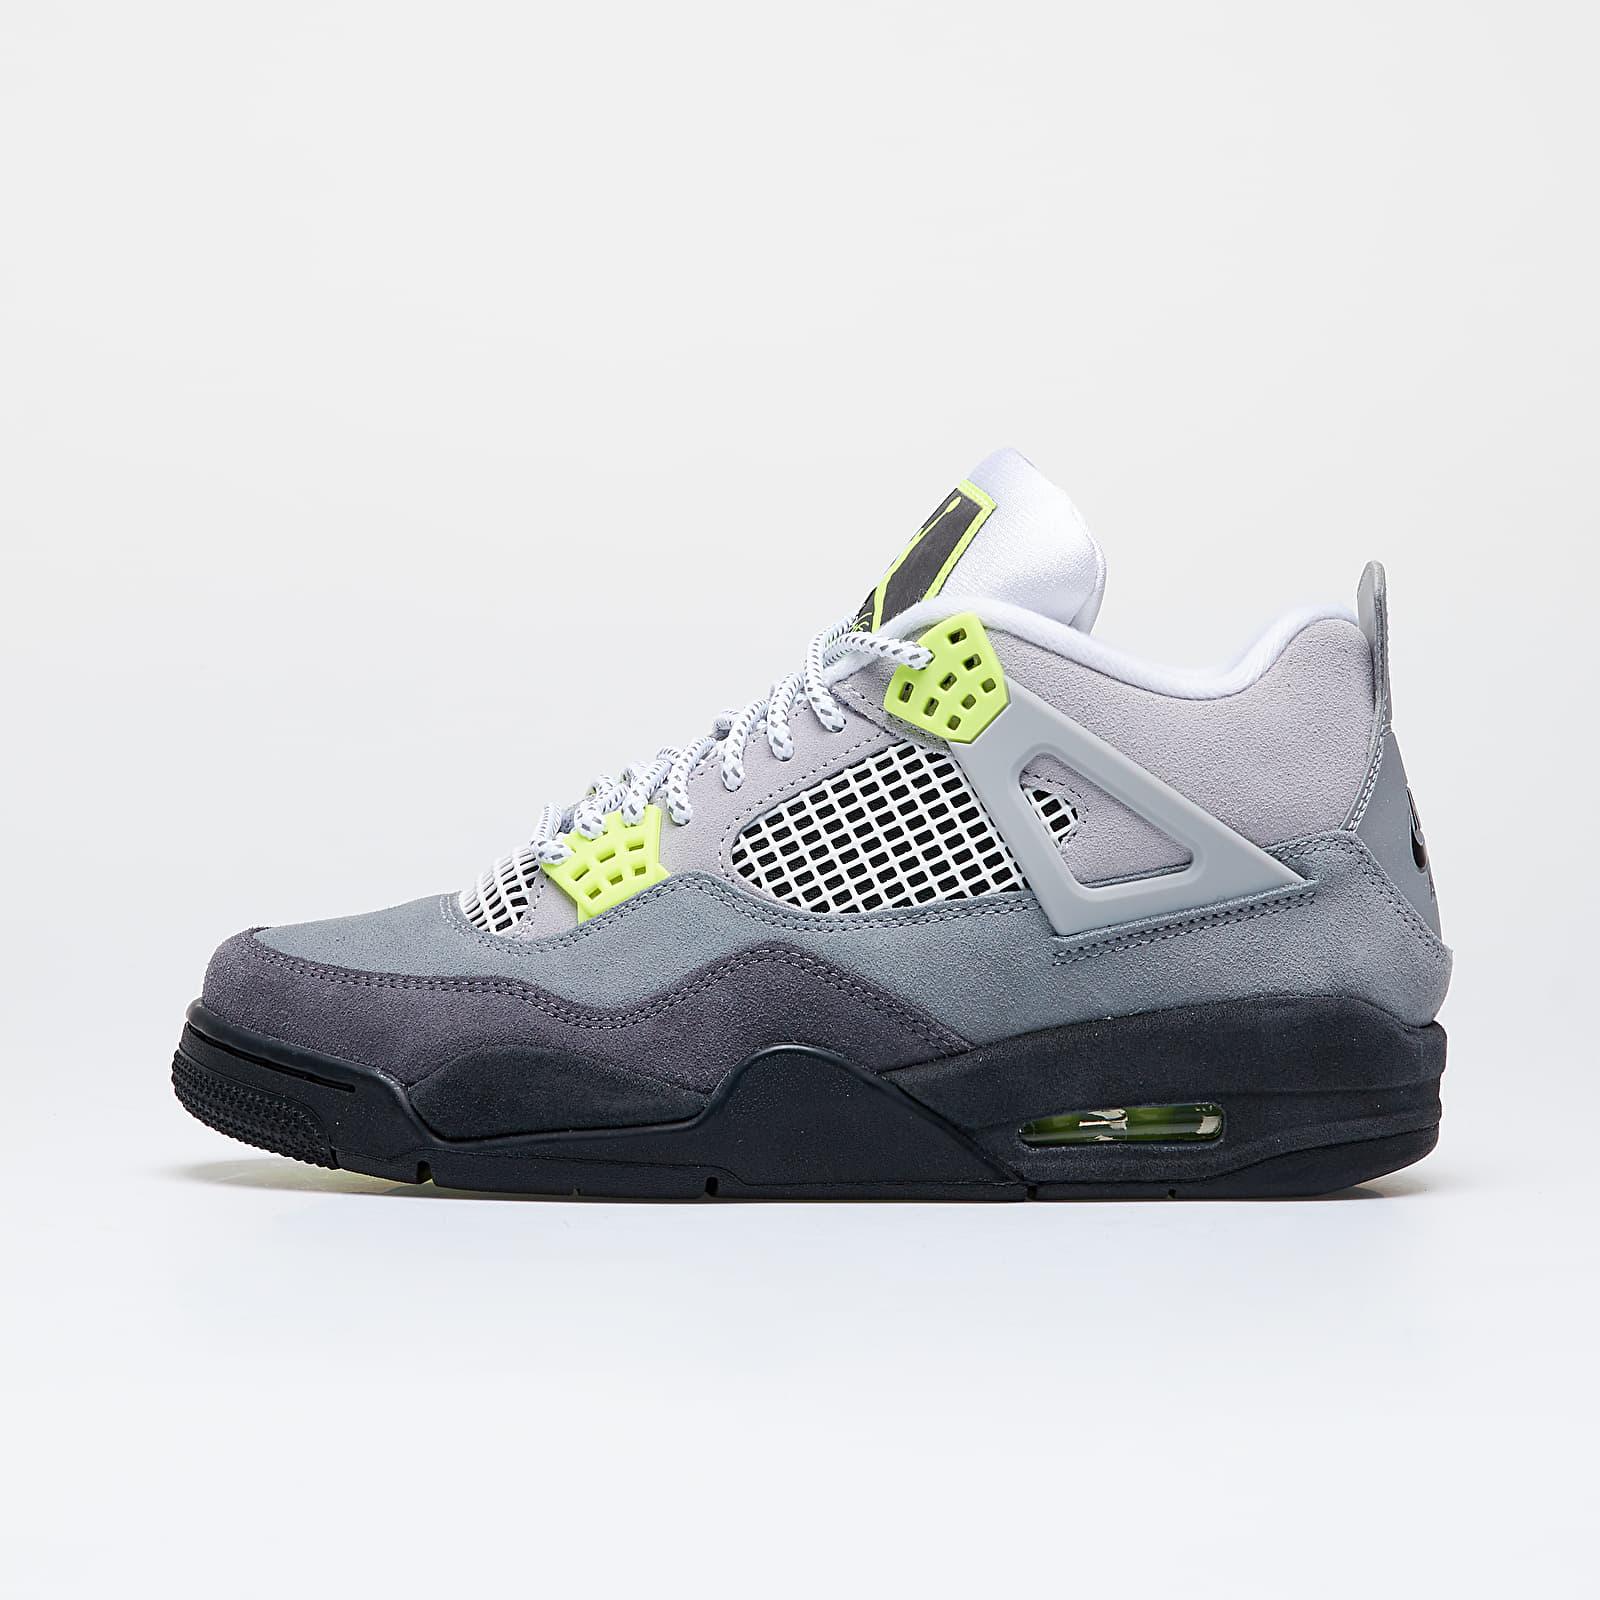 Men's shoes Air Jordan 4 Retro SE Cool